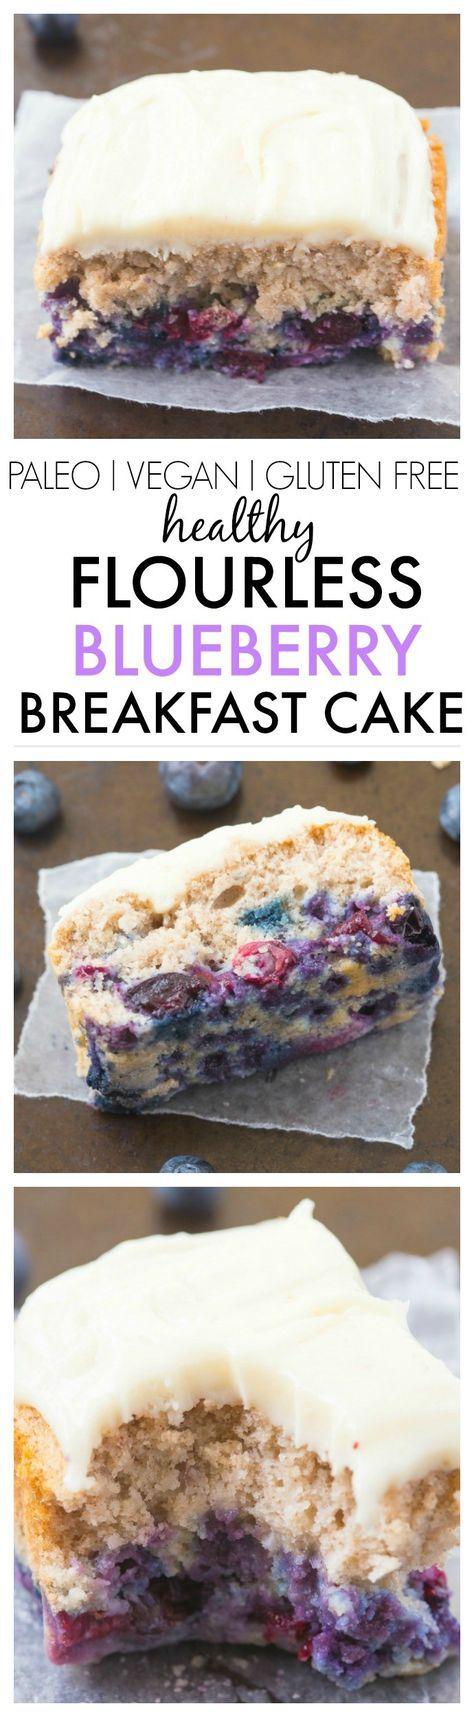 Healthy Flourless Blueberry Breakfast Cake- Light and fluffy on the inside, tender on the outside, have a guilt free dessert for breakfast- NO butter, oil, flour or sugar! {vegan, gluten free, paleo recipe}-